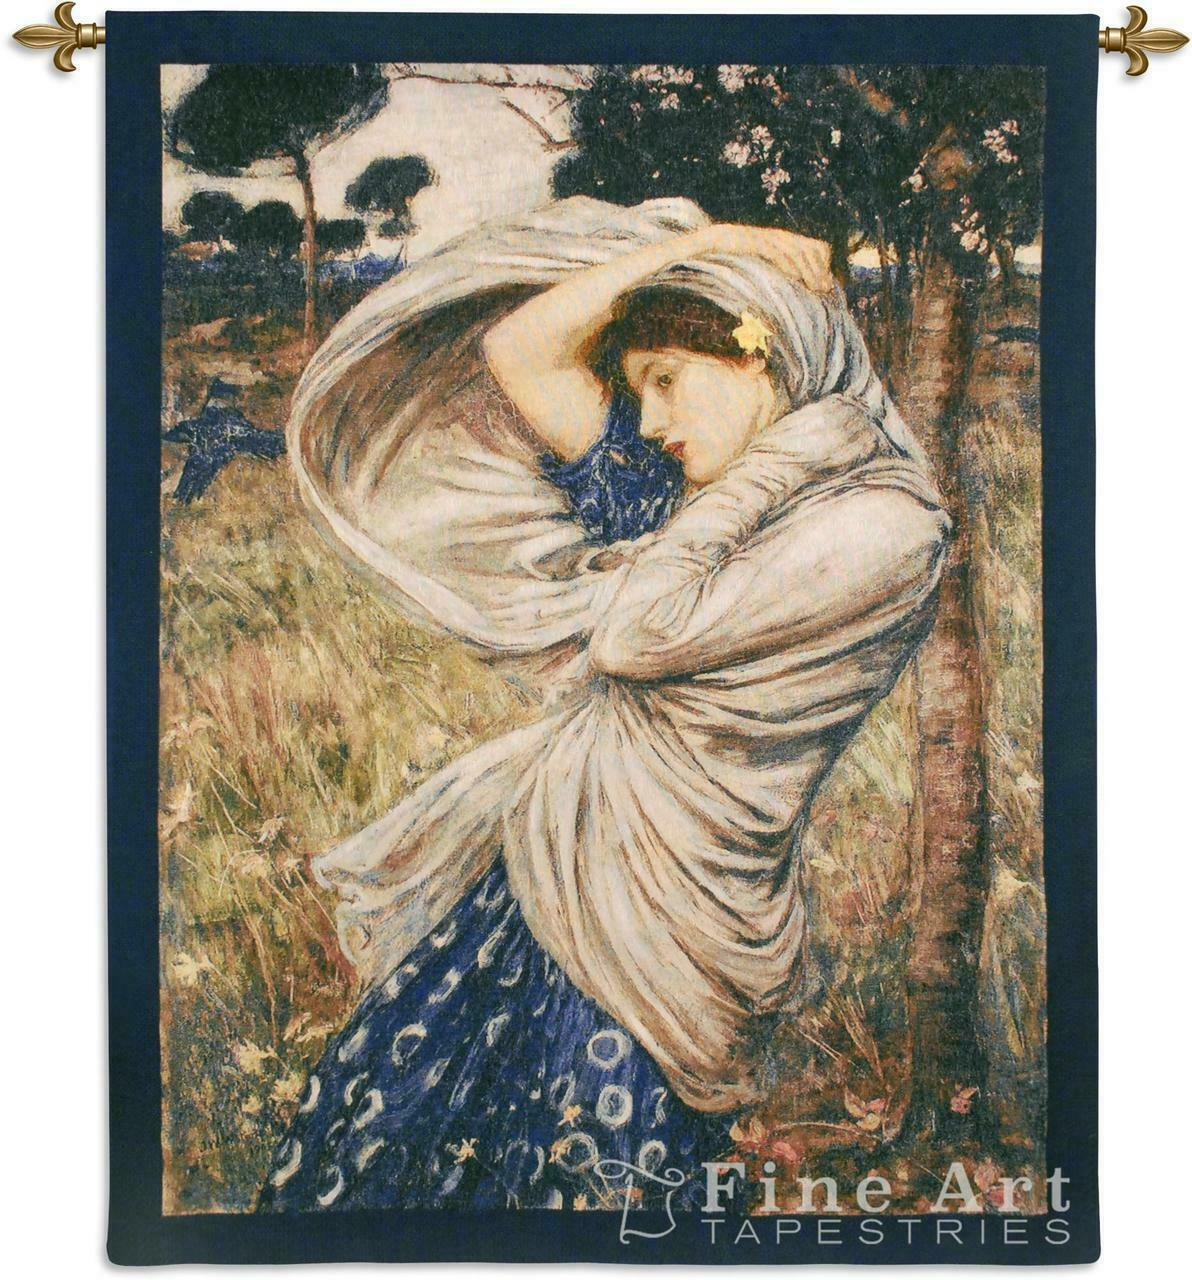 Boreas Romantic Wall Tapestry Watehouse Painting Girl Art Reproduction 40 x53